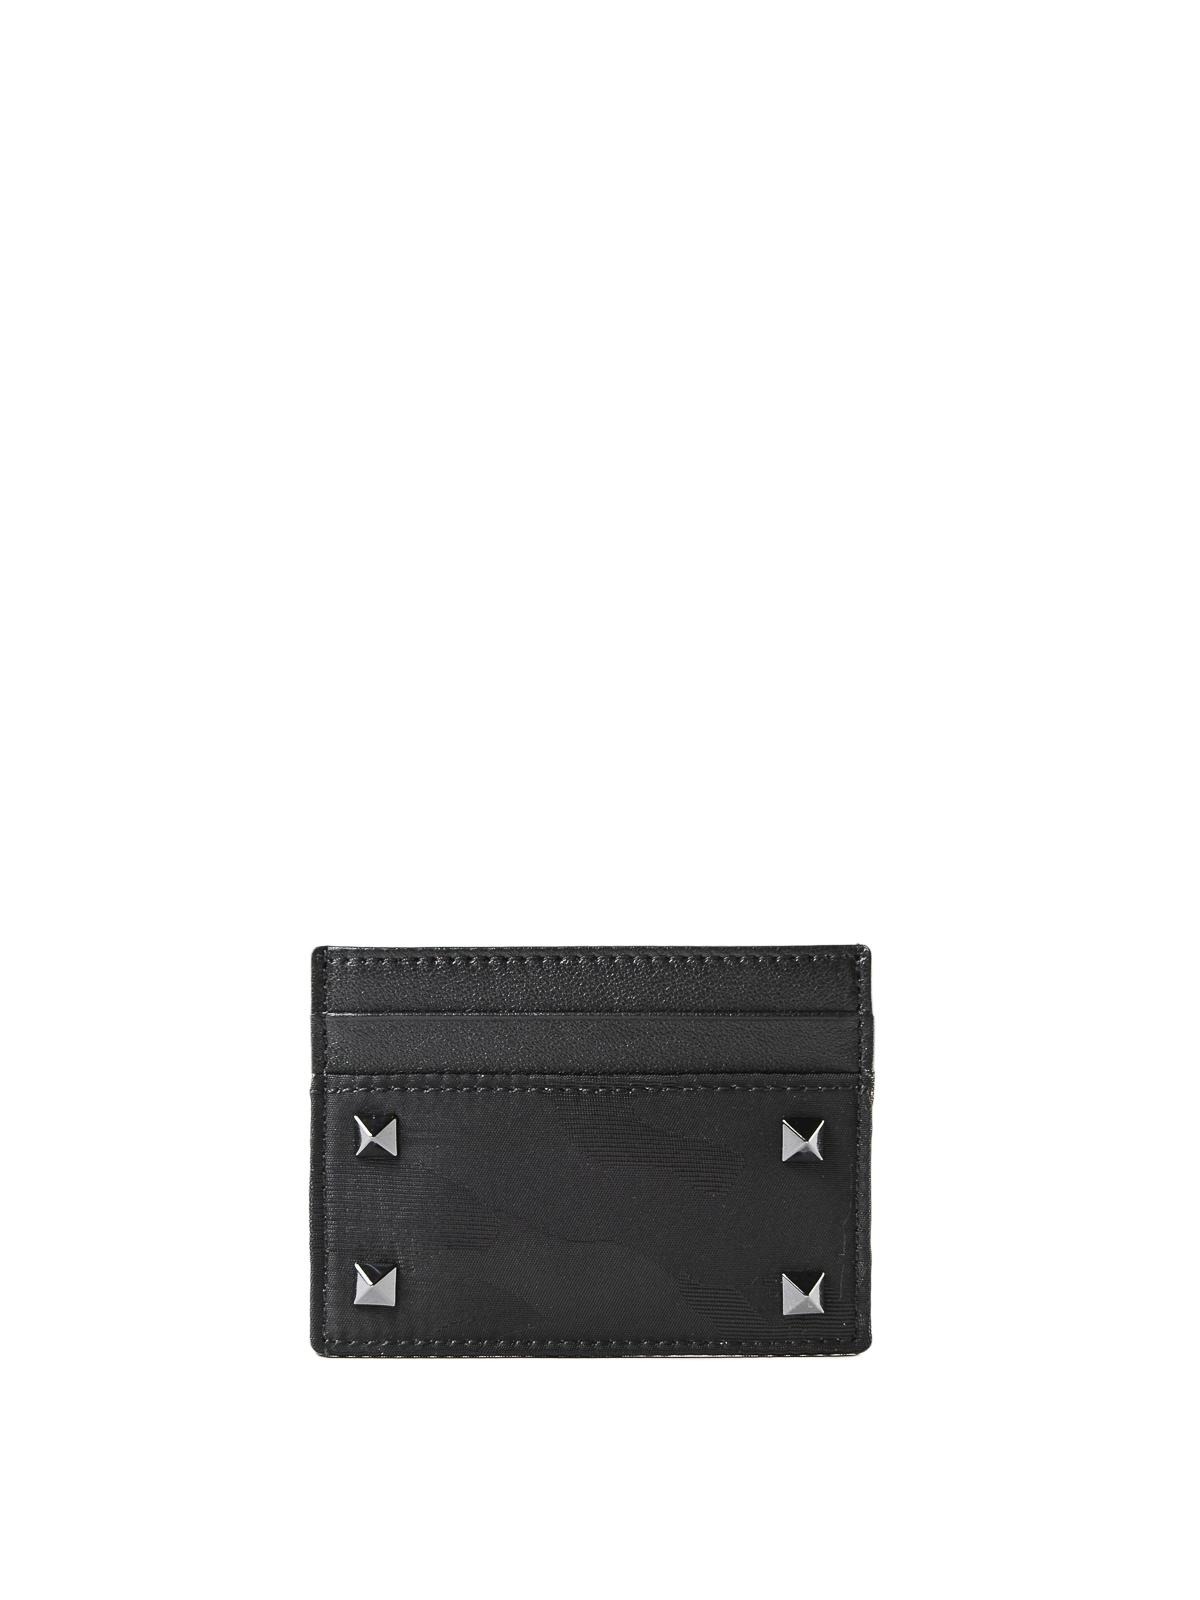 b6b1f9af3932e VALENTINO GARAVANI: wallets & purses - Tech camouflage and leather card  holder